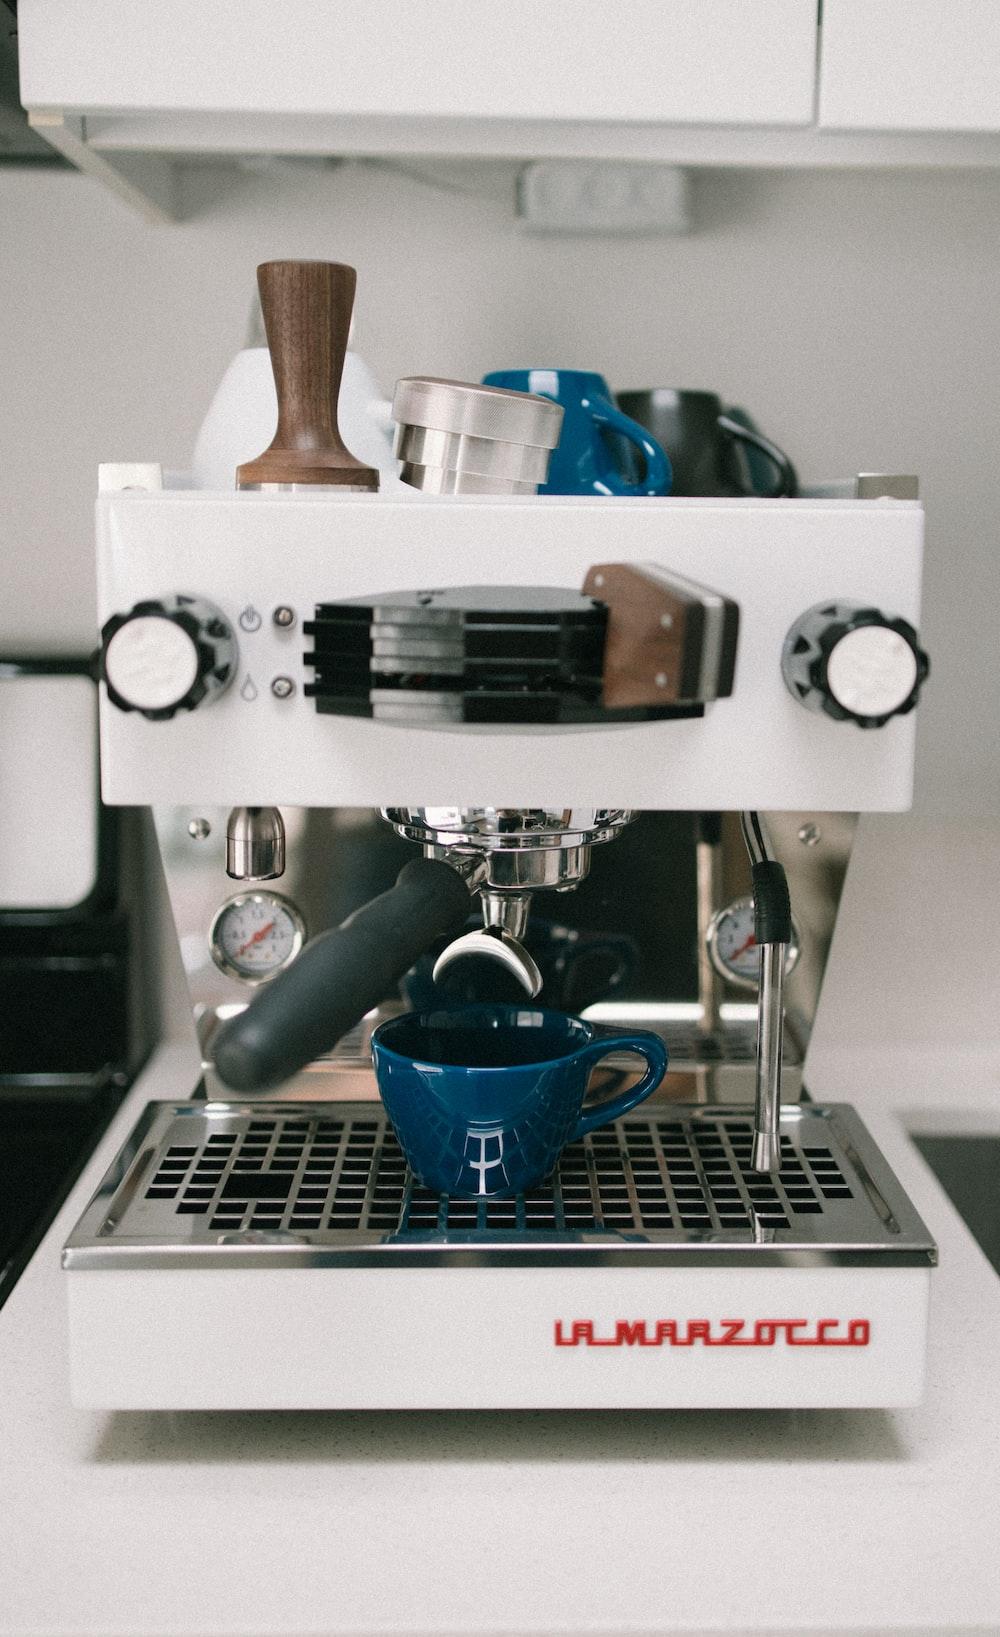 blue ceramic mug on silver and black coffee maker